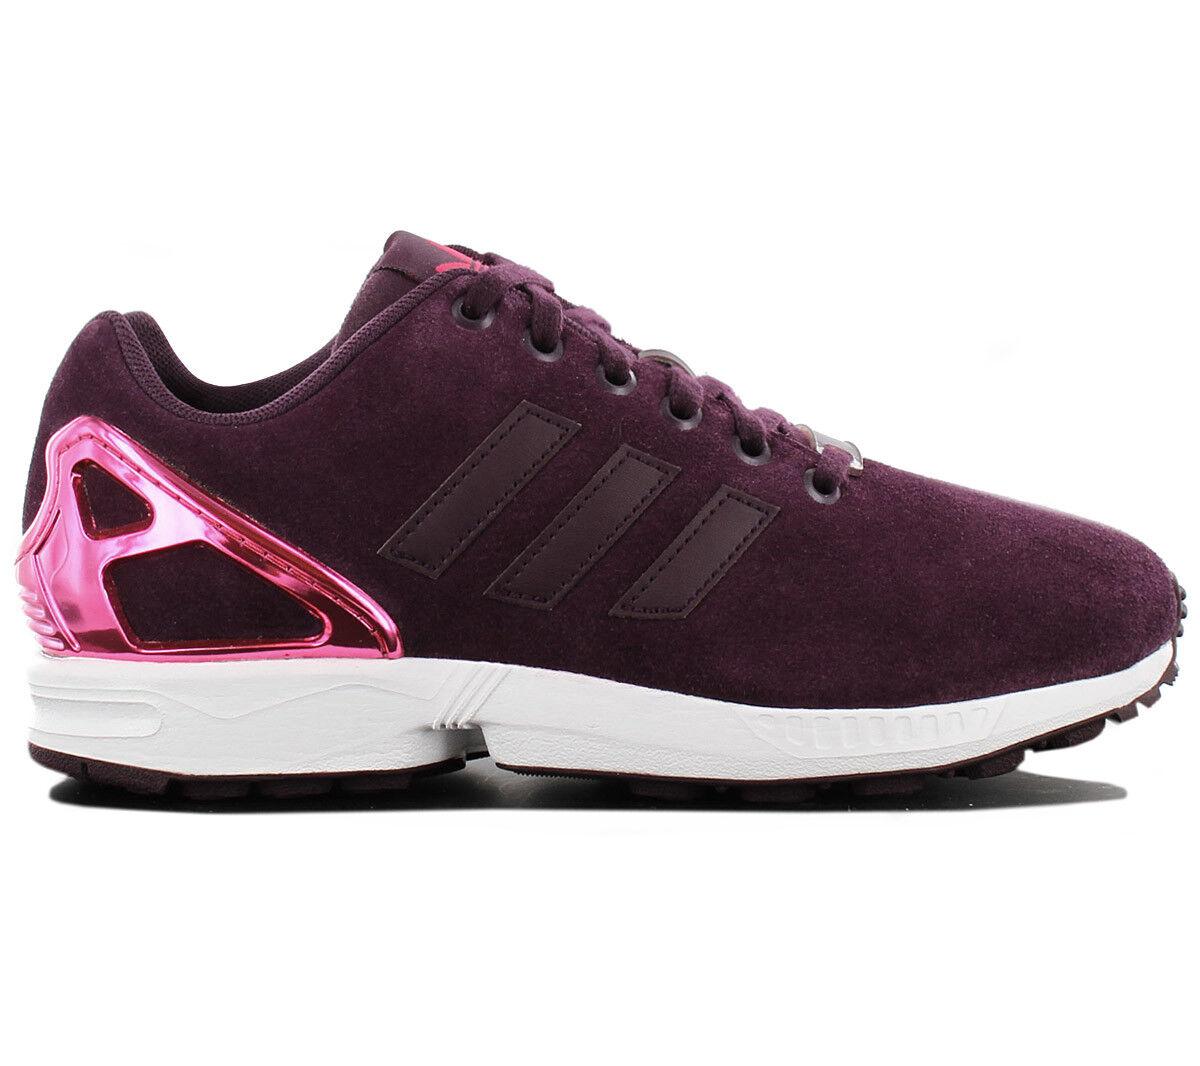 Adidas Originals Zx Flux W-Women's W-Women's W-Women's Trainers shoes Leather purple B35320 Trainers 3d69b5